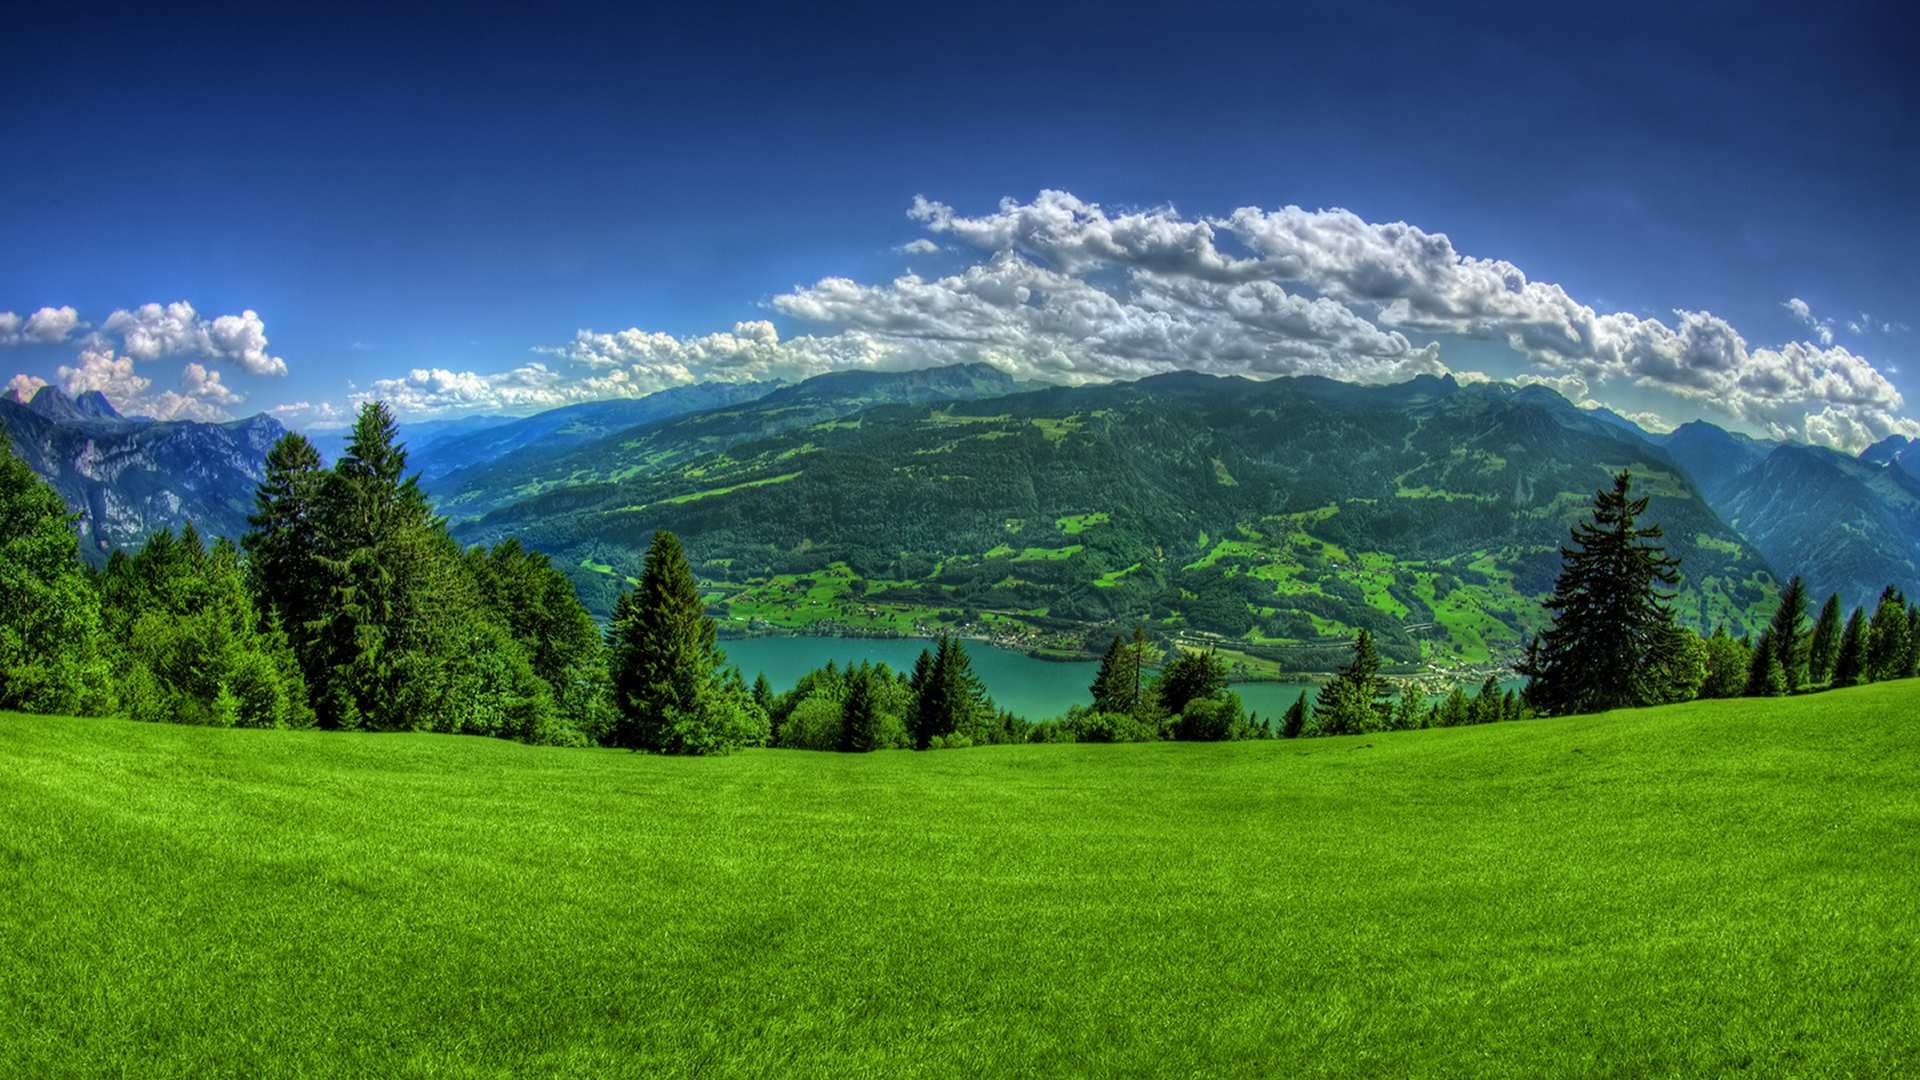 Switzerland Beautiful Nature Wallpaper Landscape Wallpaper Summer Landscape